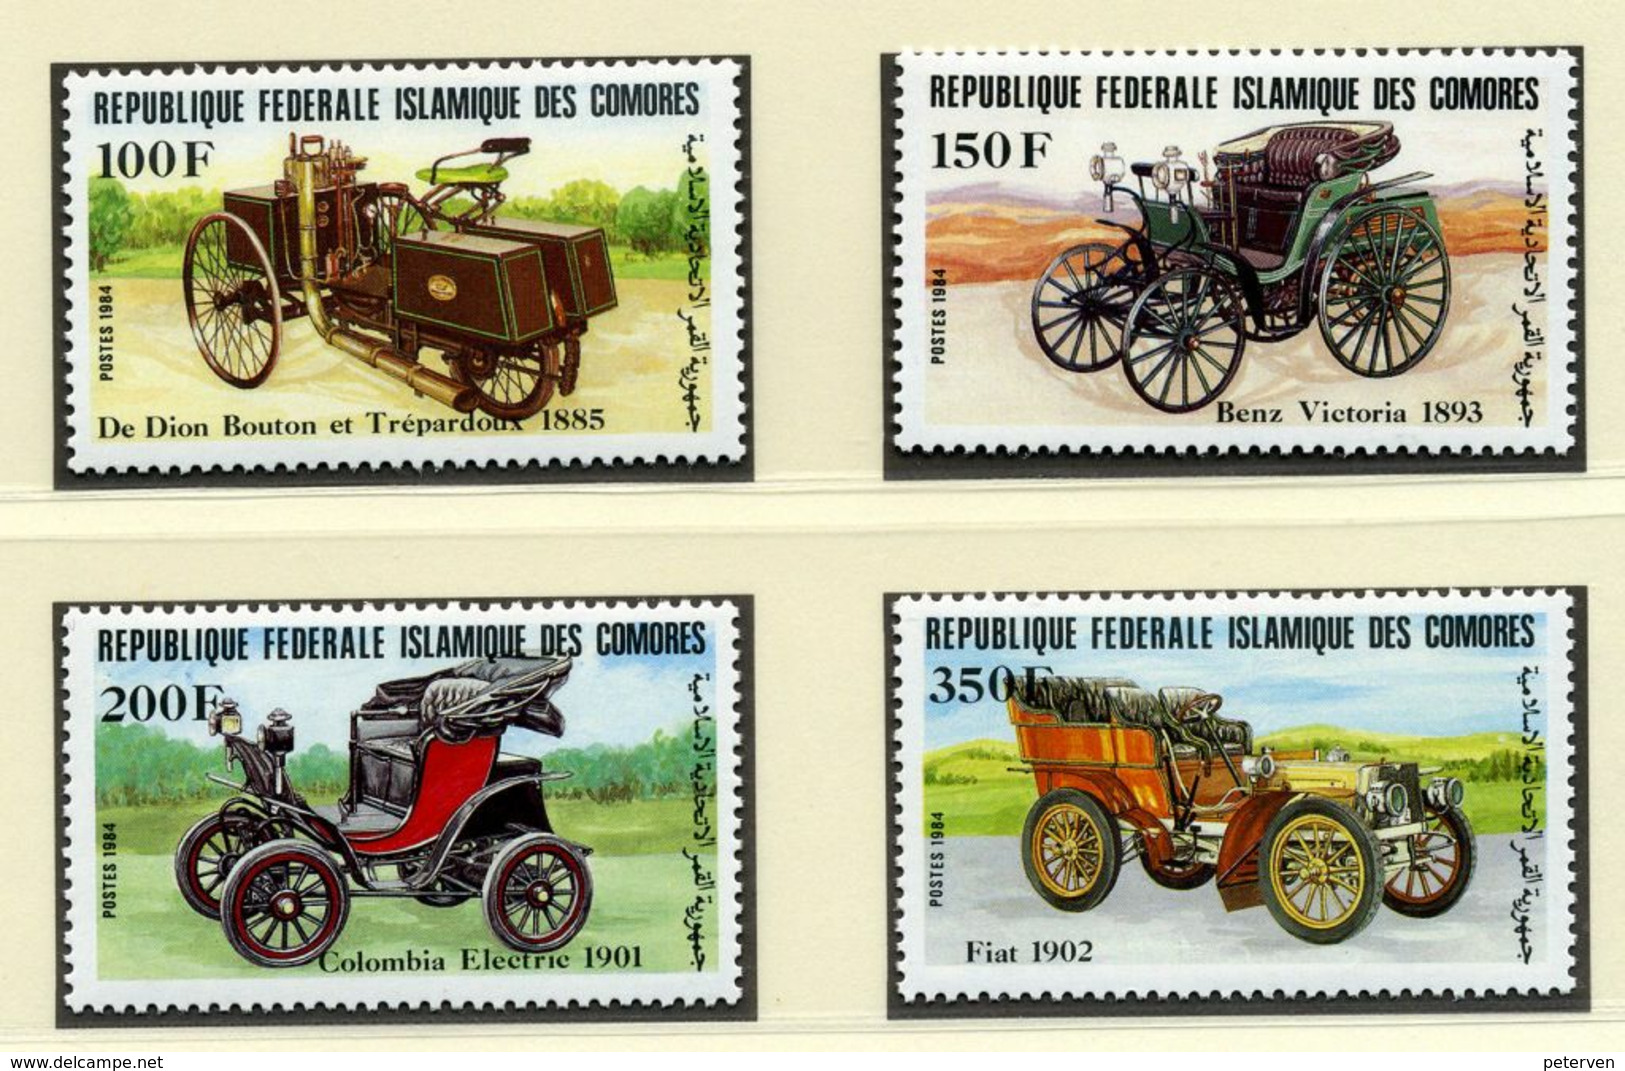 Comoren: Histor. (Uralt-)Automobile1984; Postfrisch/MNH - Cars